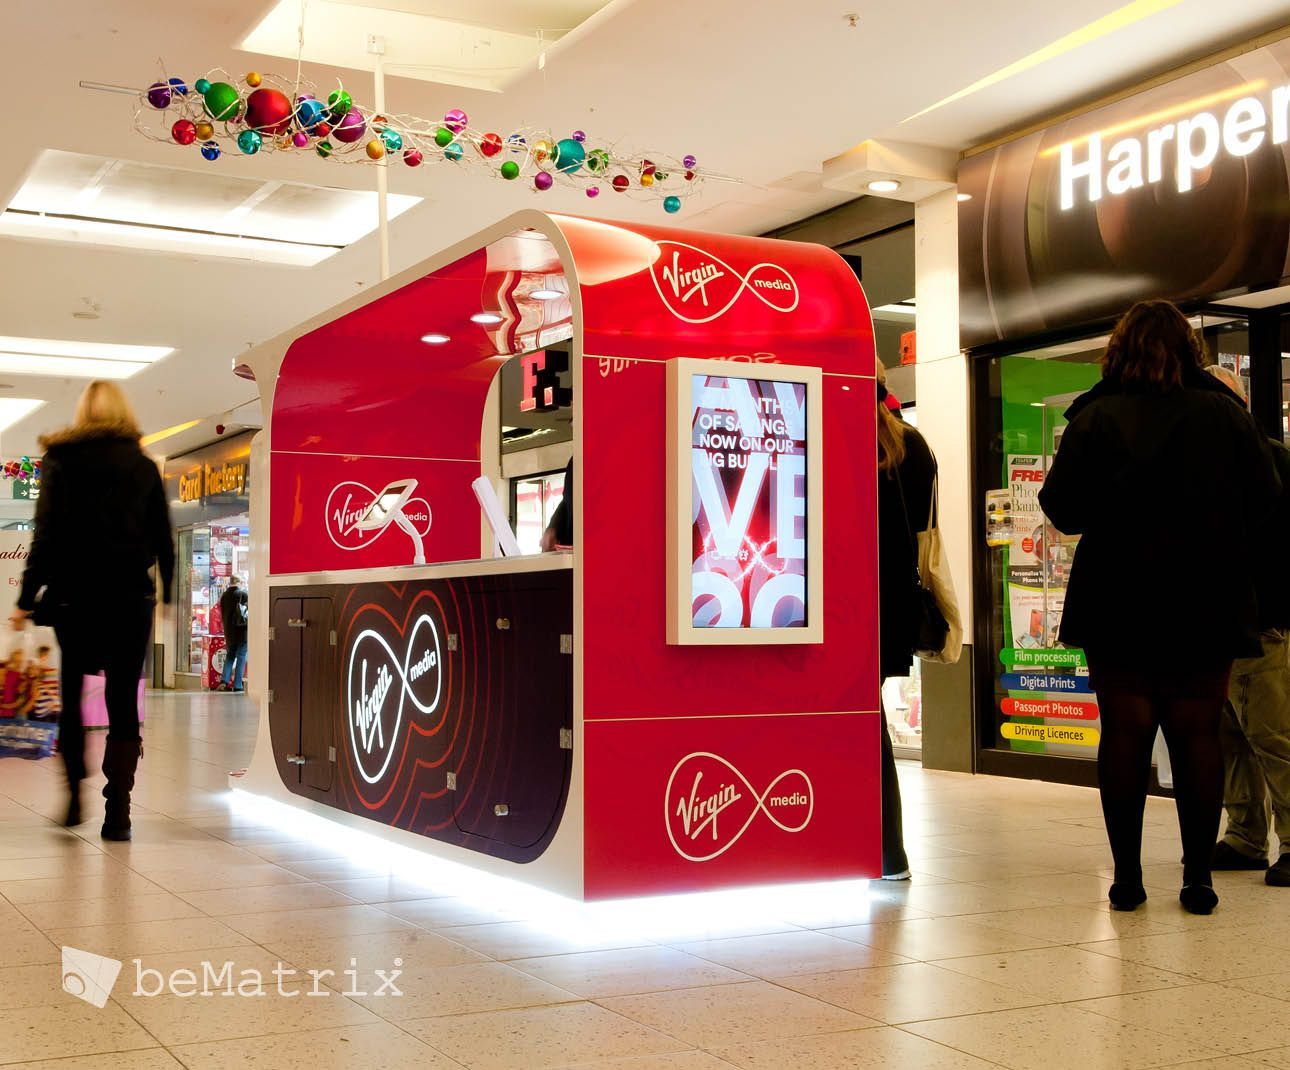 Virgin Kiosk Custom Made Structure Bematrix Finishing Client Enigma Popup Kiosk Bematrix Kiosk Modular Display Exhibition Booth